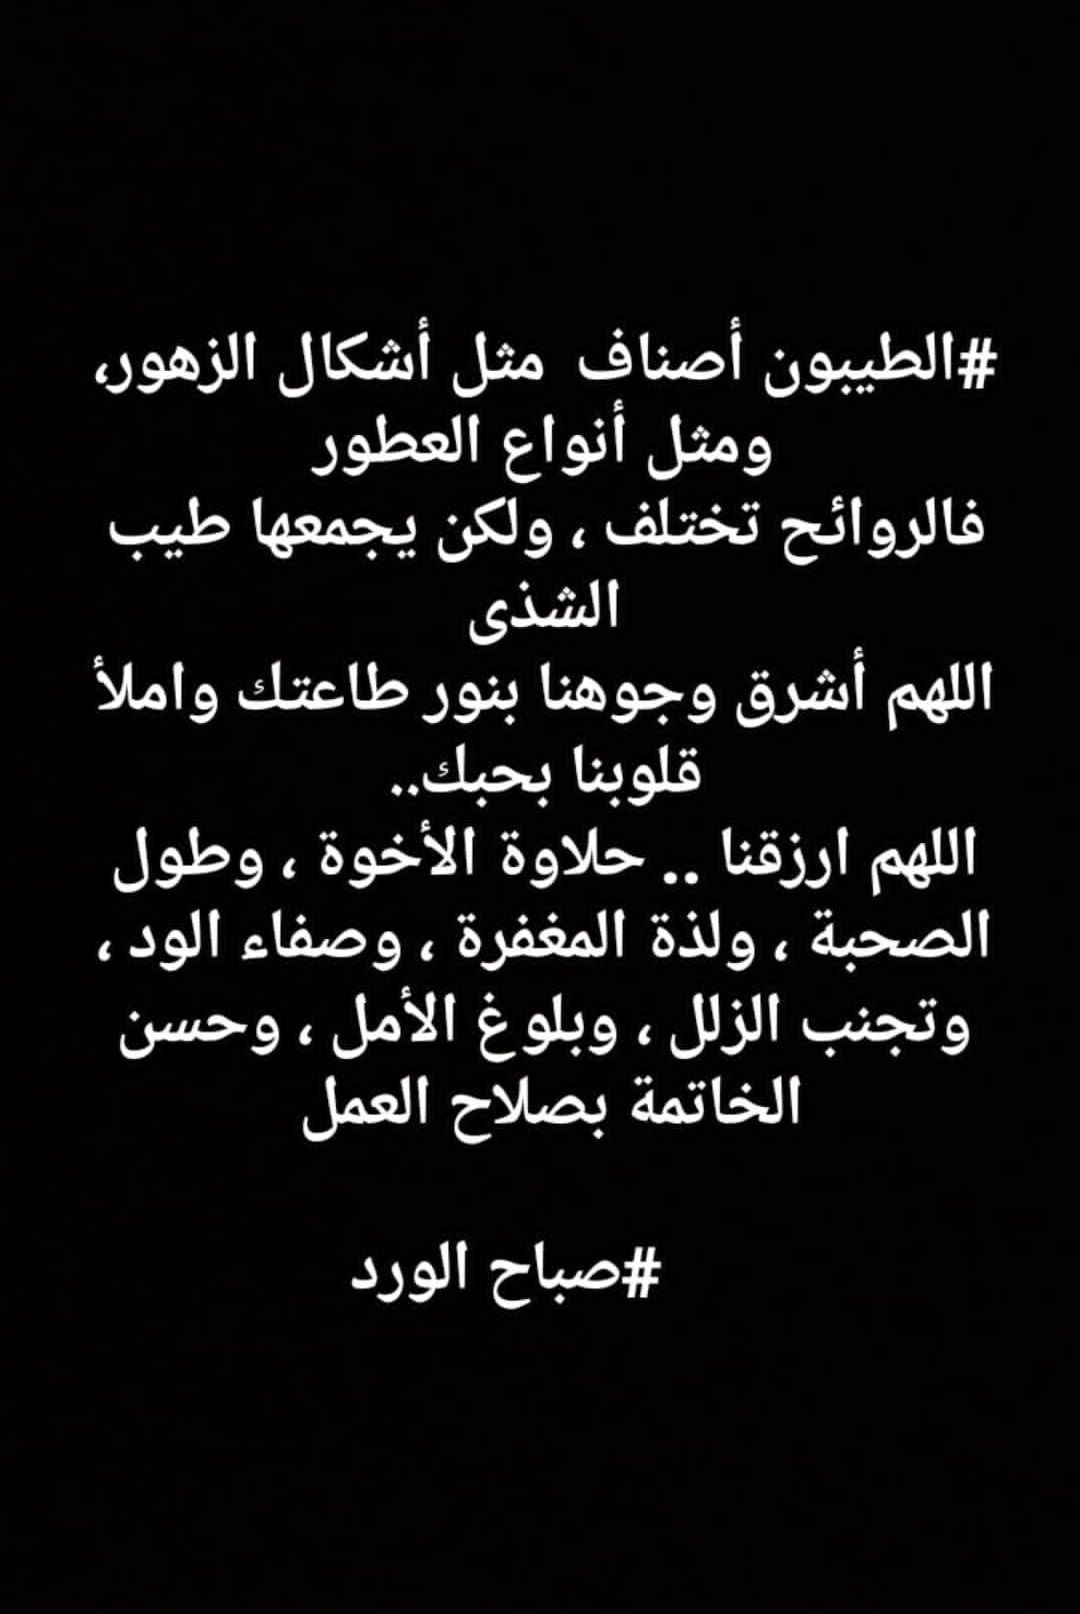 Pin By أحمد البحيرى On كتب وح ــــــكم للحياة Photo Quotes Quotes Poetry Quotes